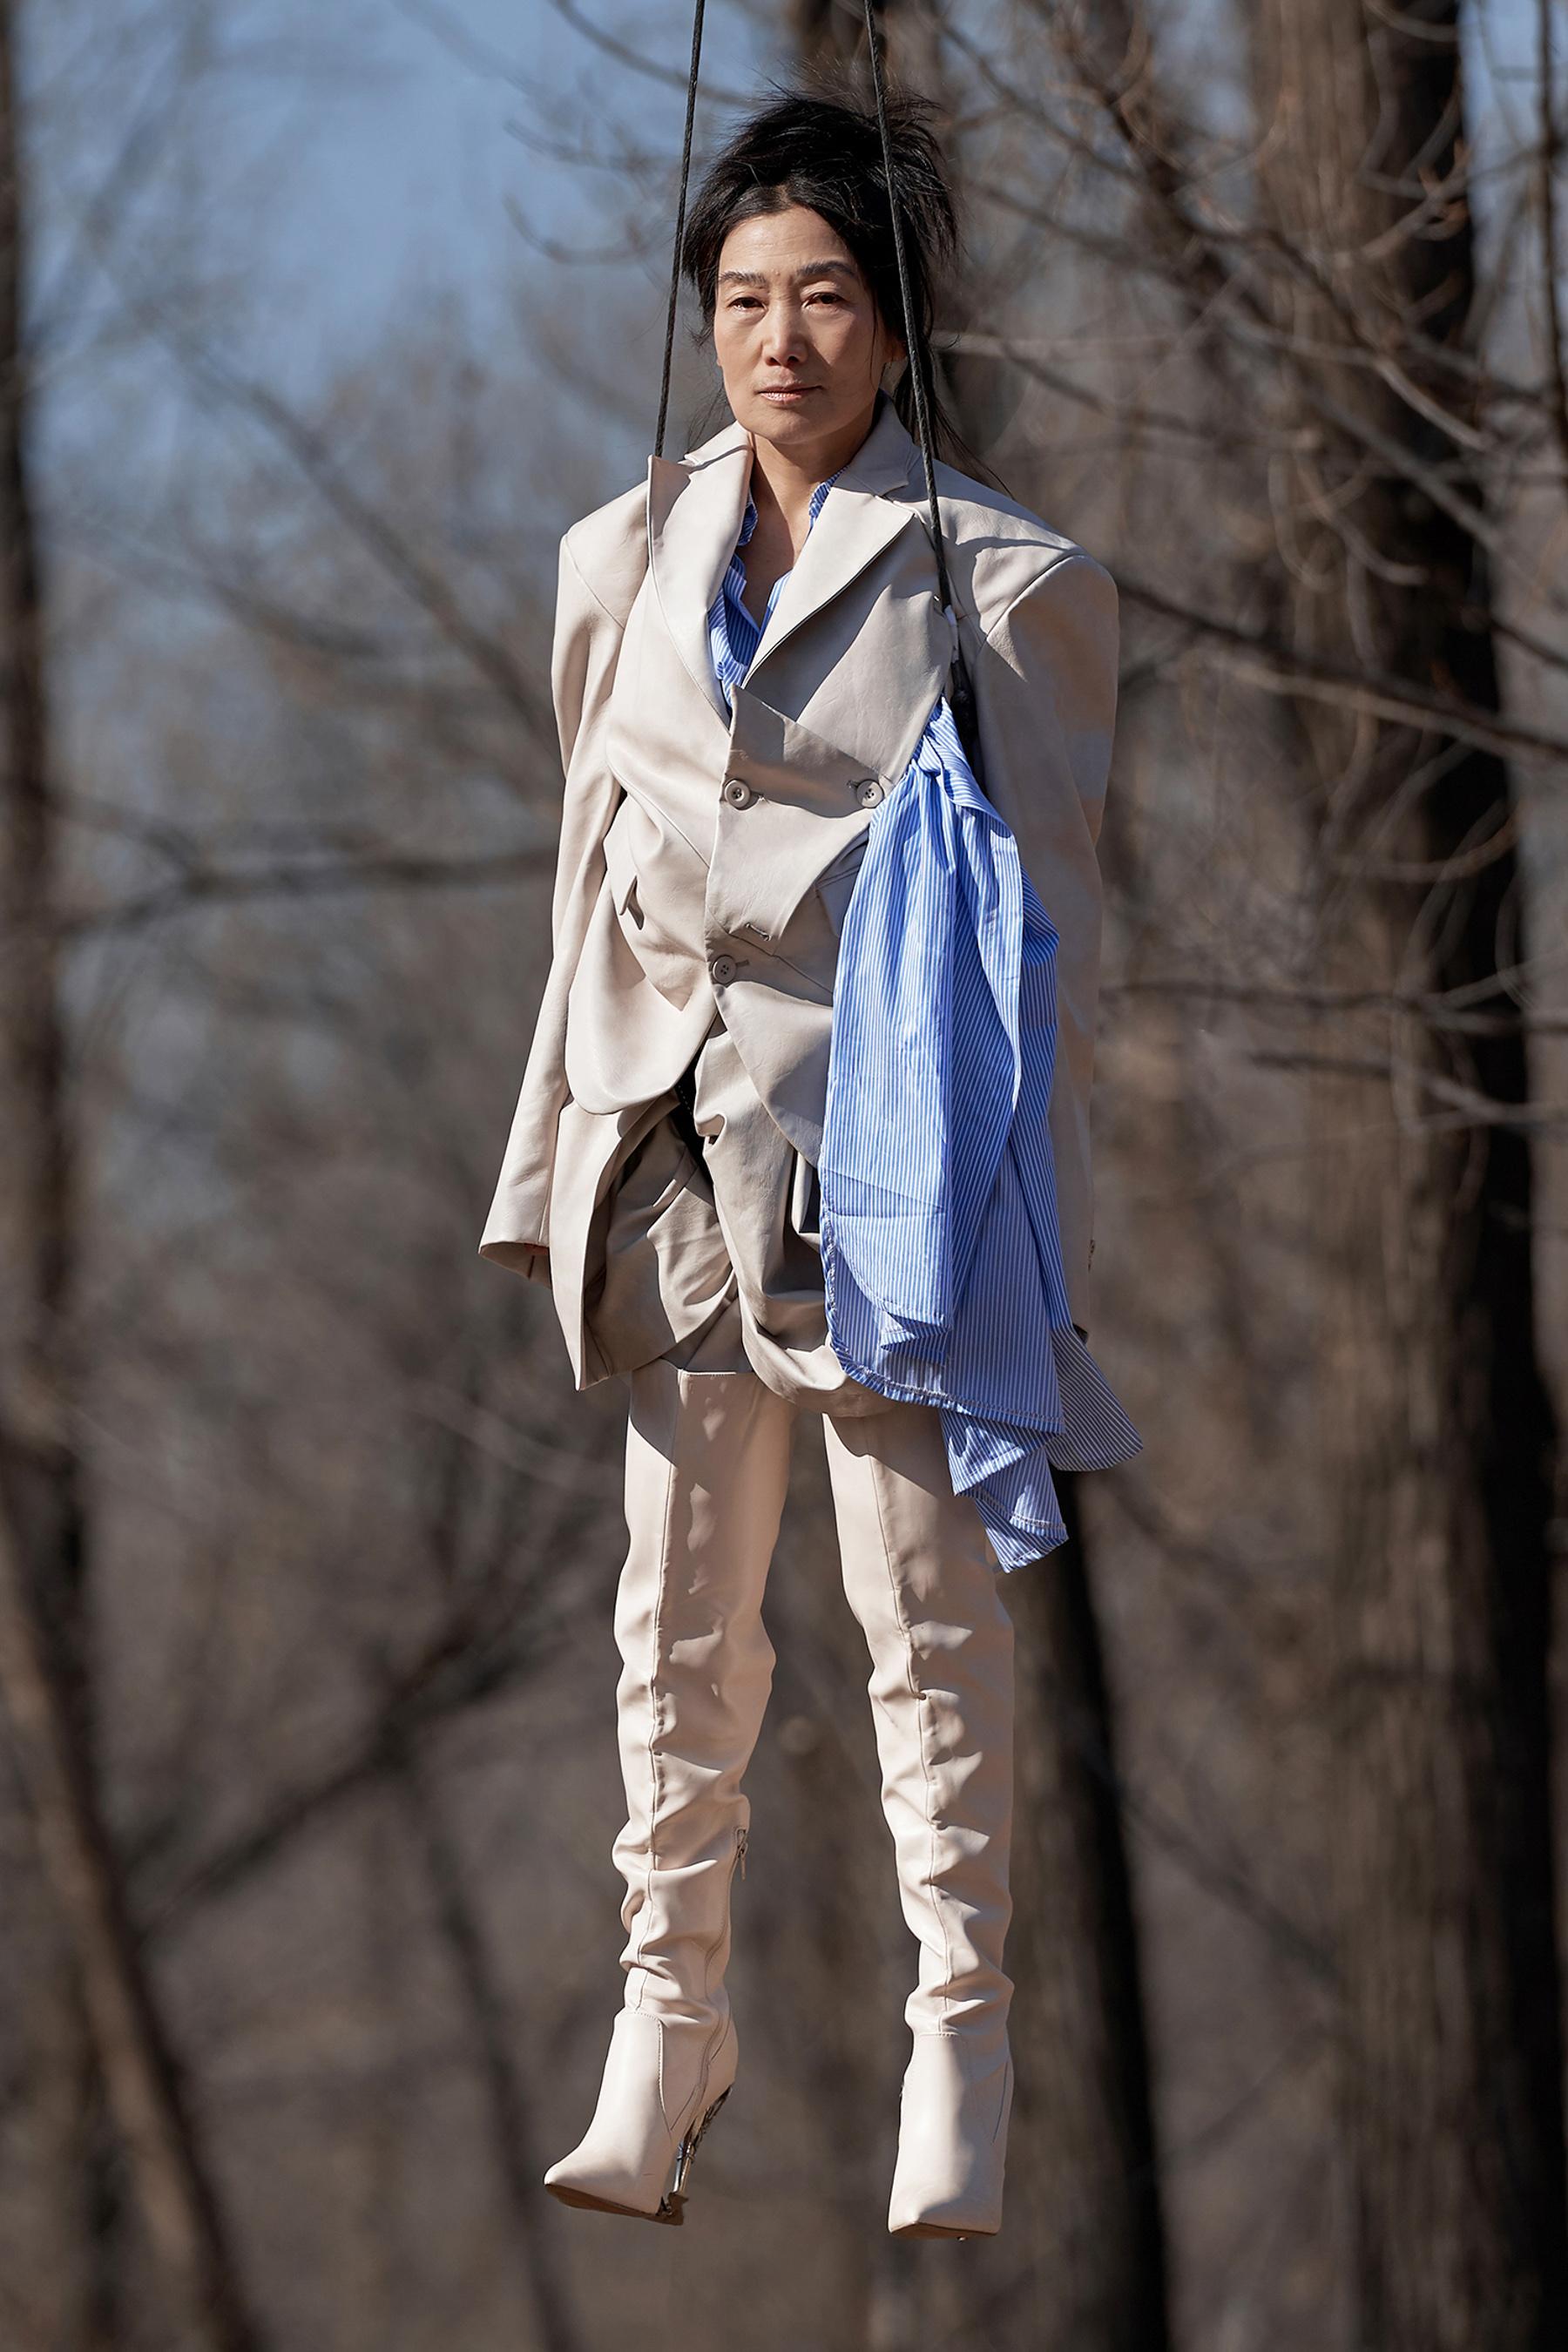 Marrknull Fall 2021 Fashion Show